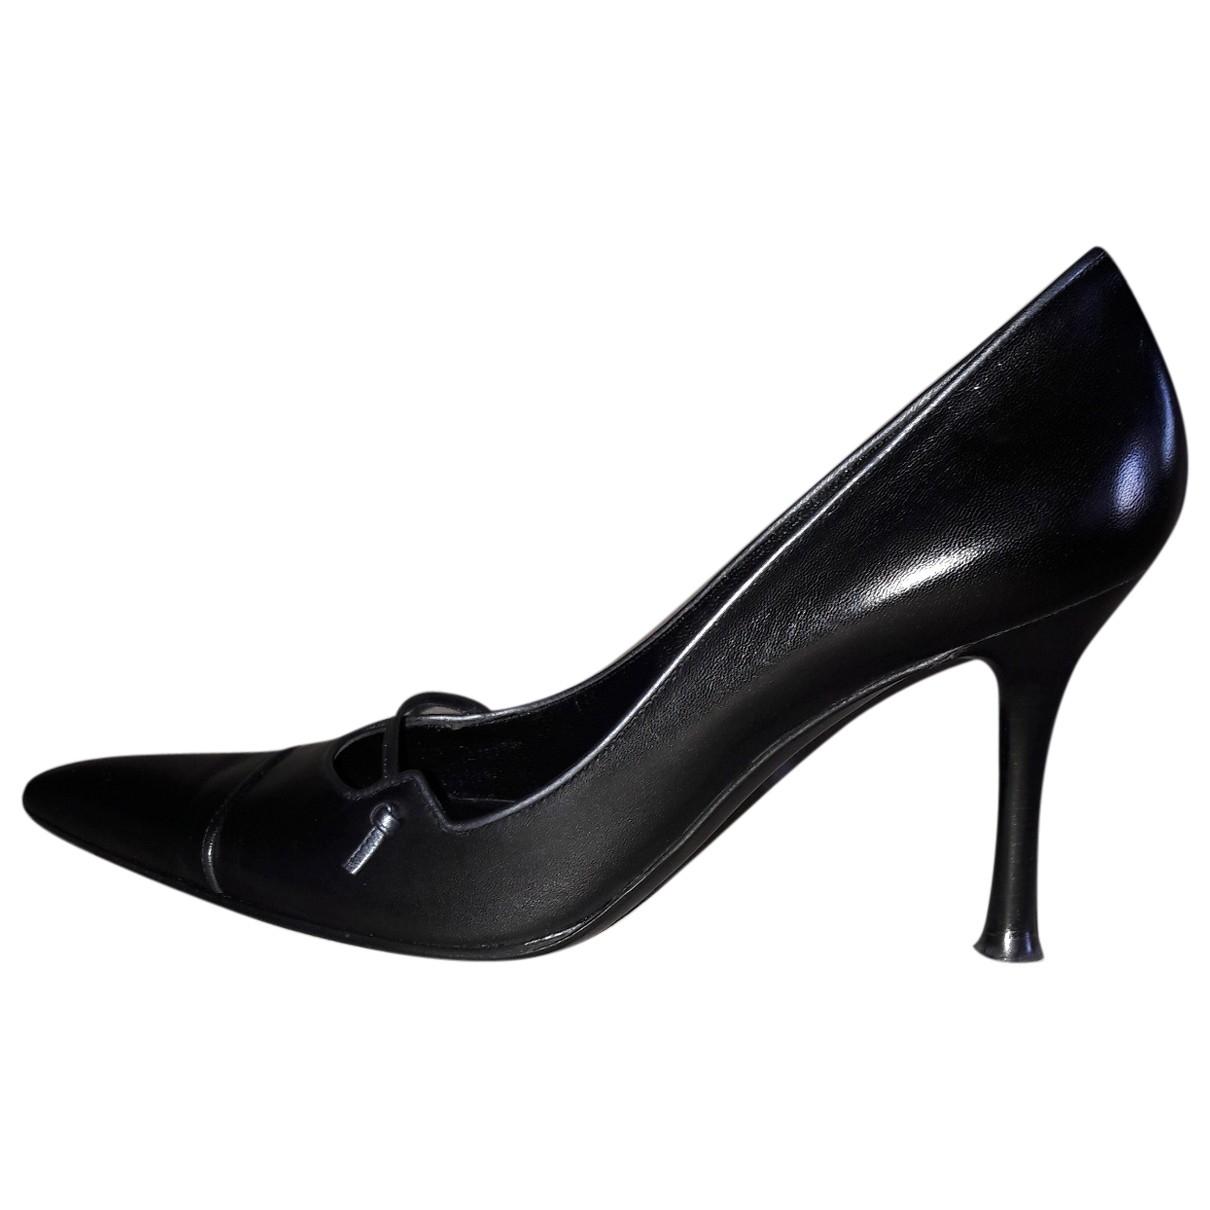 Sergio Rossi \N Black Leather Heels for Women 39.5 EU